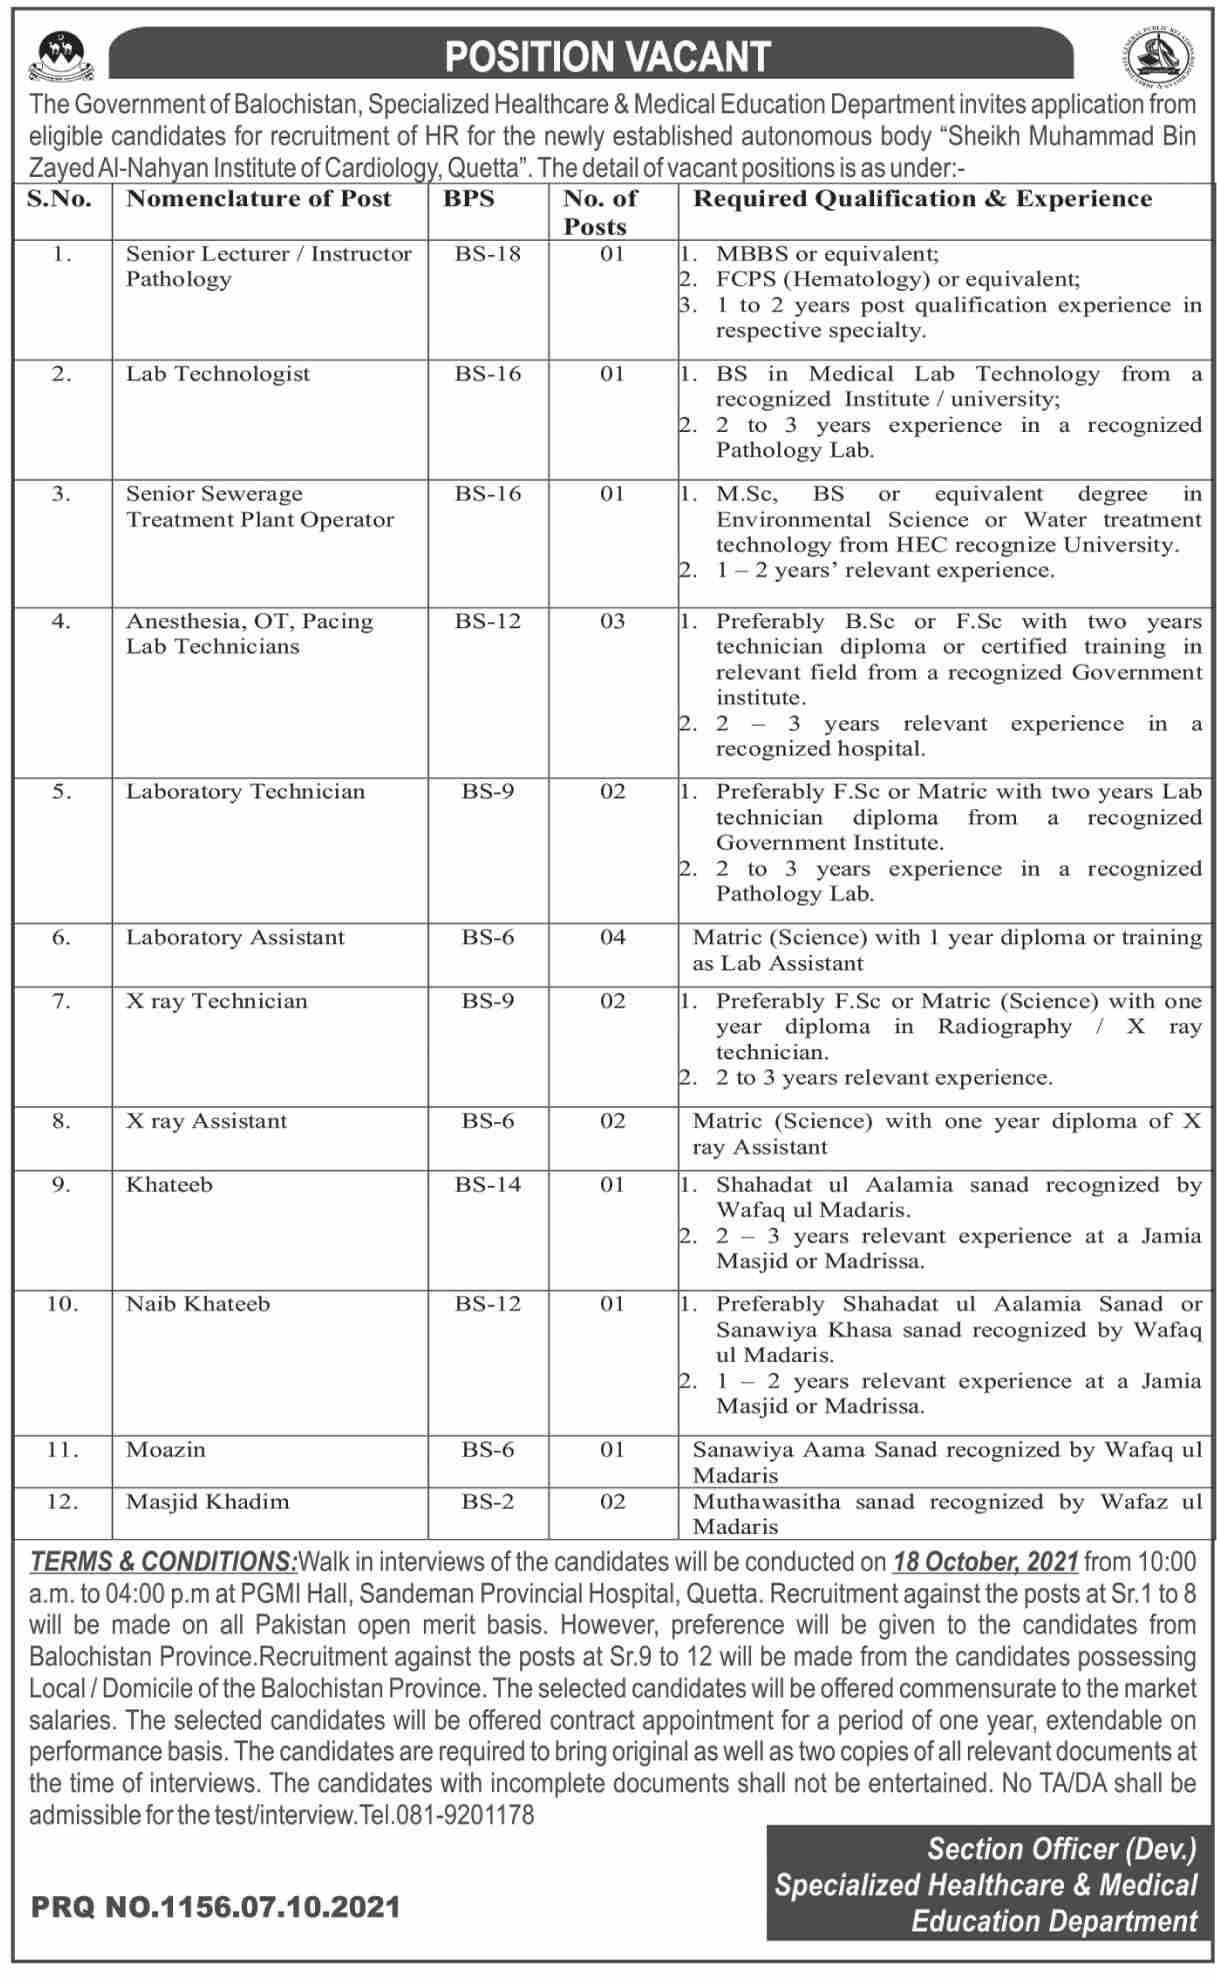 M. Bin Zayed Al Nahyan Institute of Cardiology  Quetta Jobs